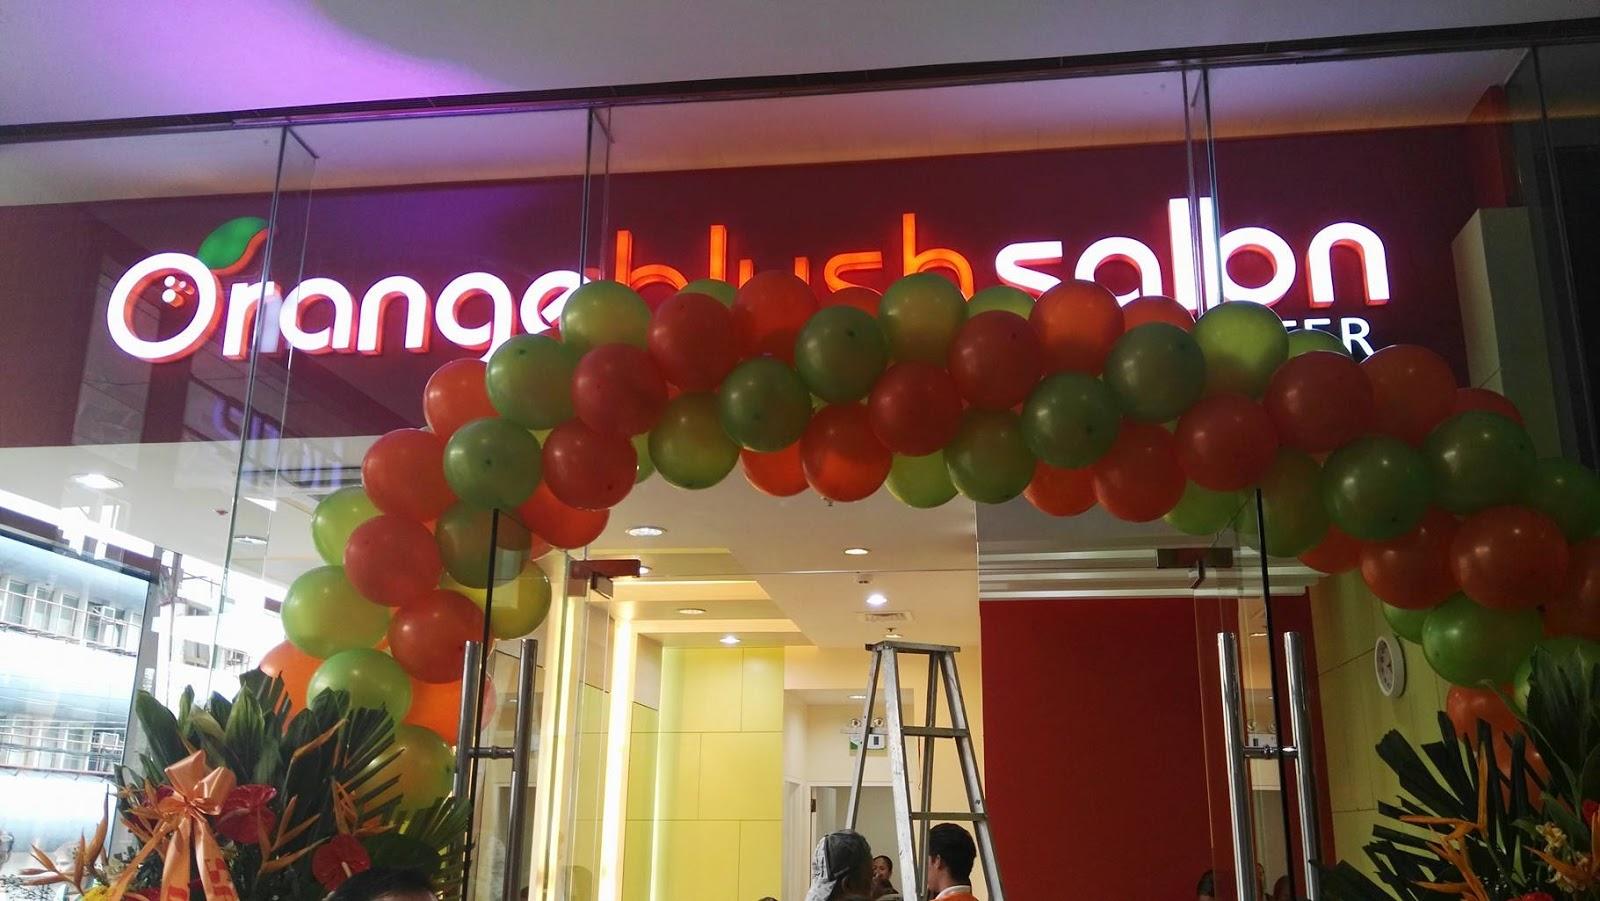 Orange blush salon opens metro manila flagship salon in for Salon orange